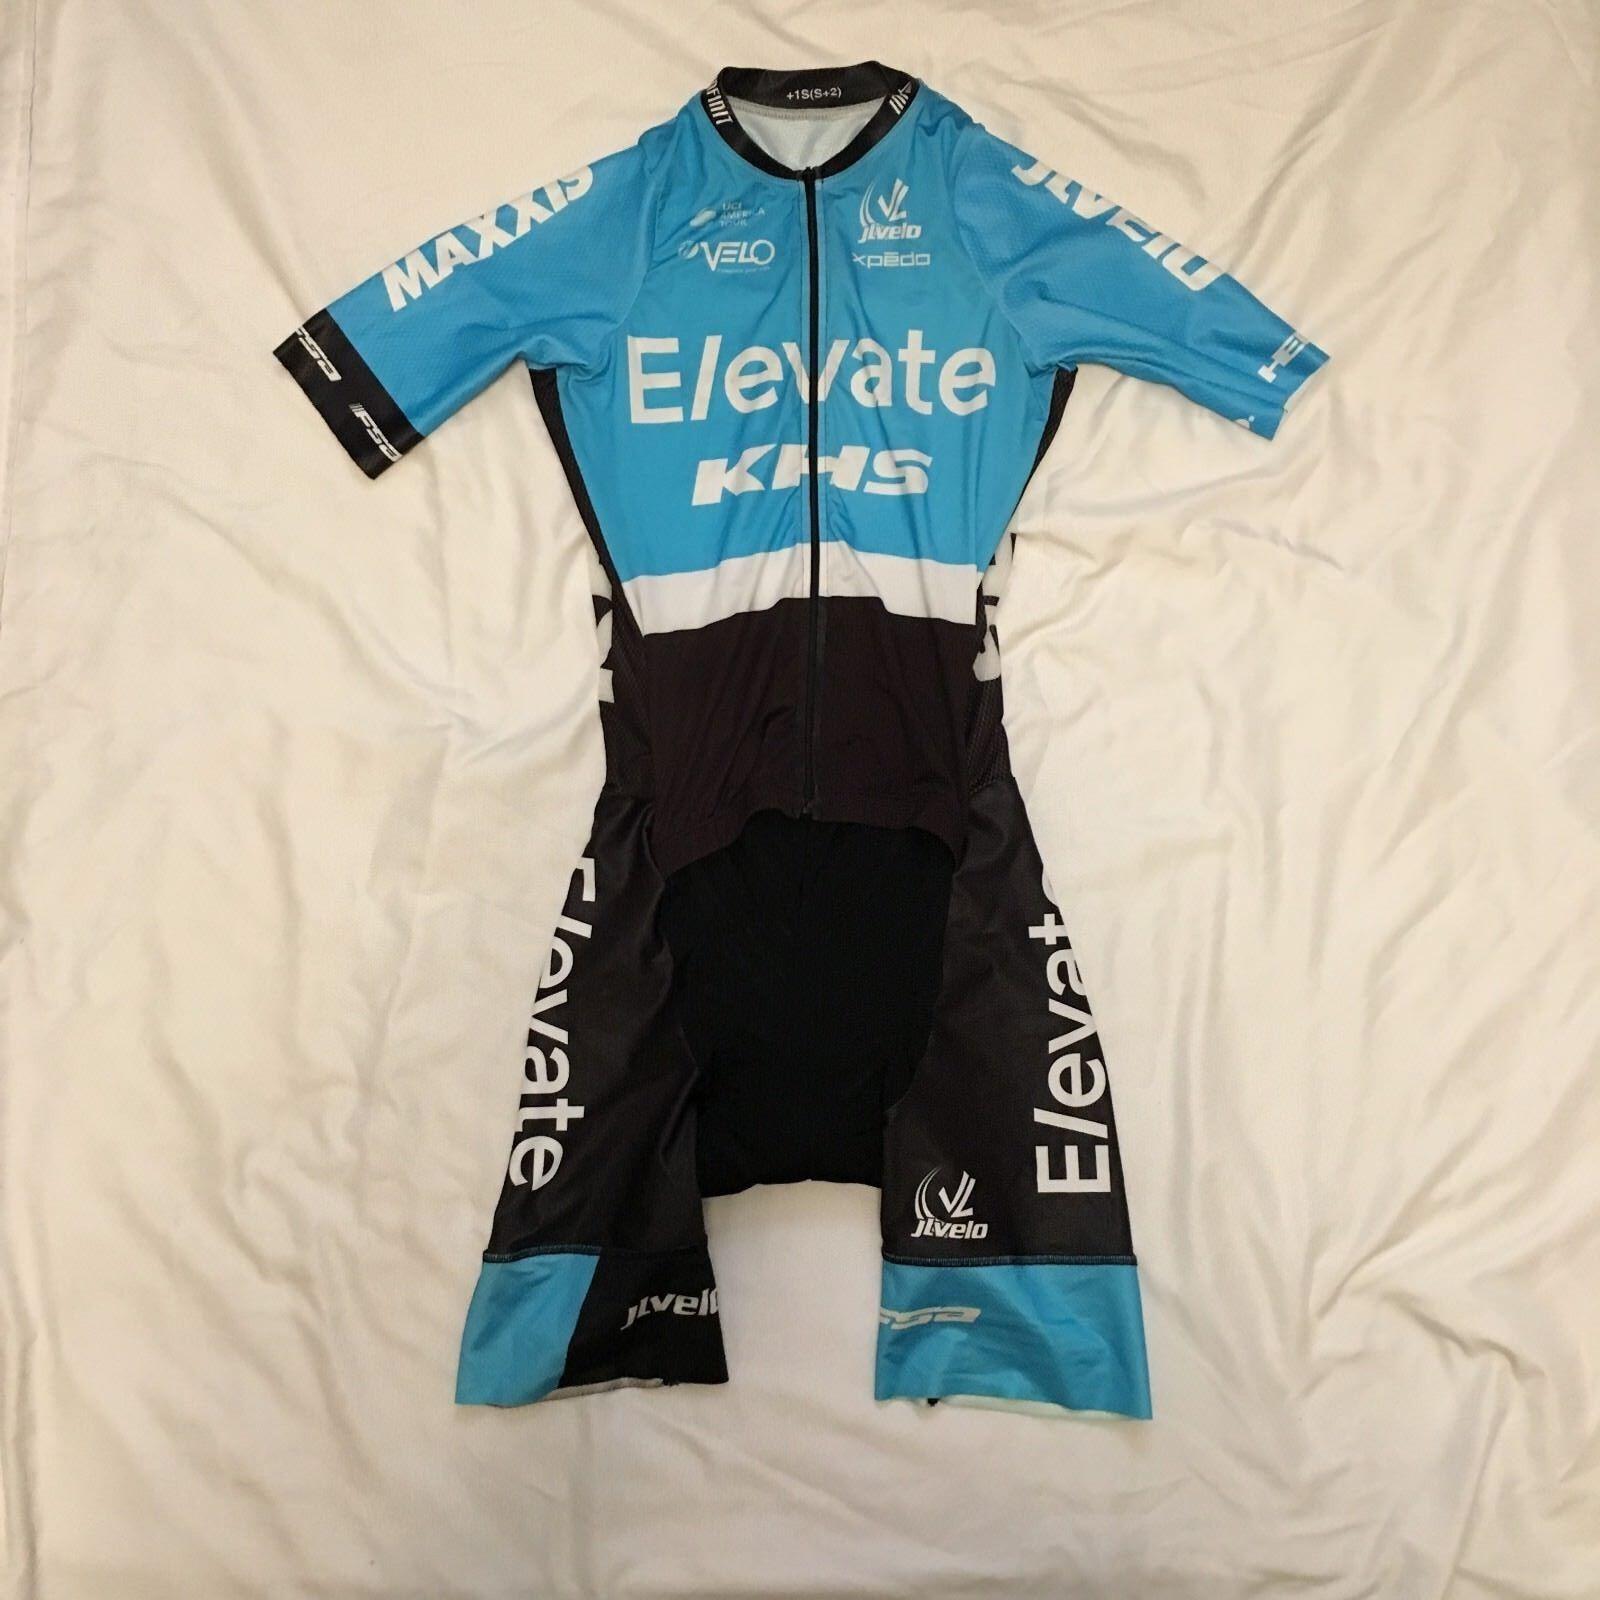 Men's 2017 JL Velo KHS Elevate Pro Ciclismo traje para ciclismo de manga corta, azul claro, XS Usado En Excelente Condición